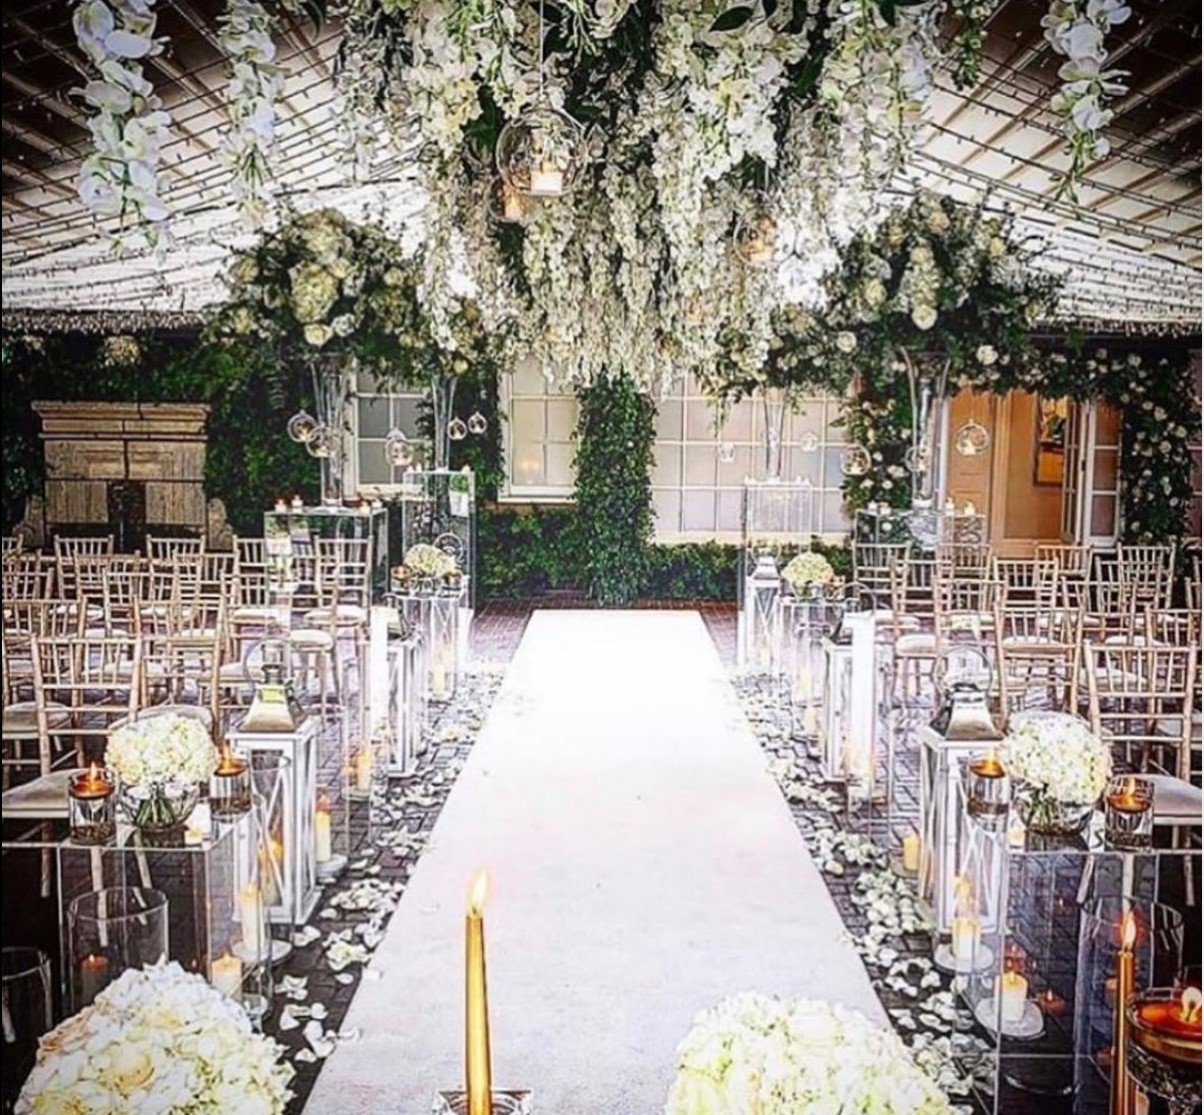 Dale Alexander Weddings & Events - UK luxury wedding planner - international wedding planner - unconventional wedding - wedding supplier directory - luxury wedding styling